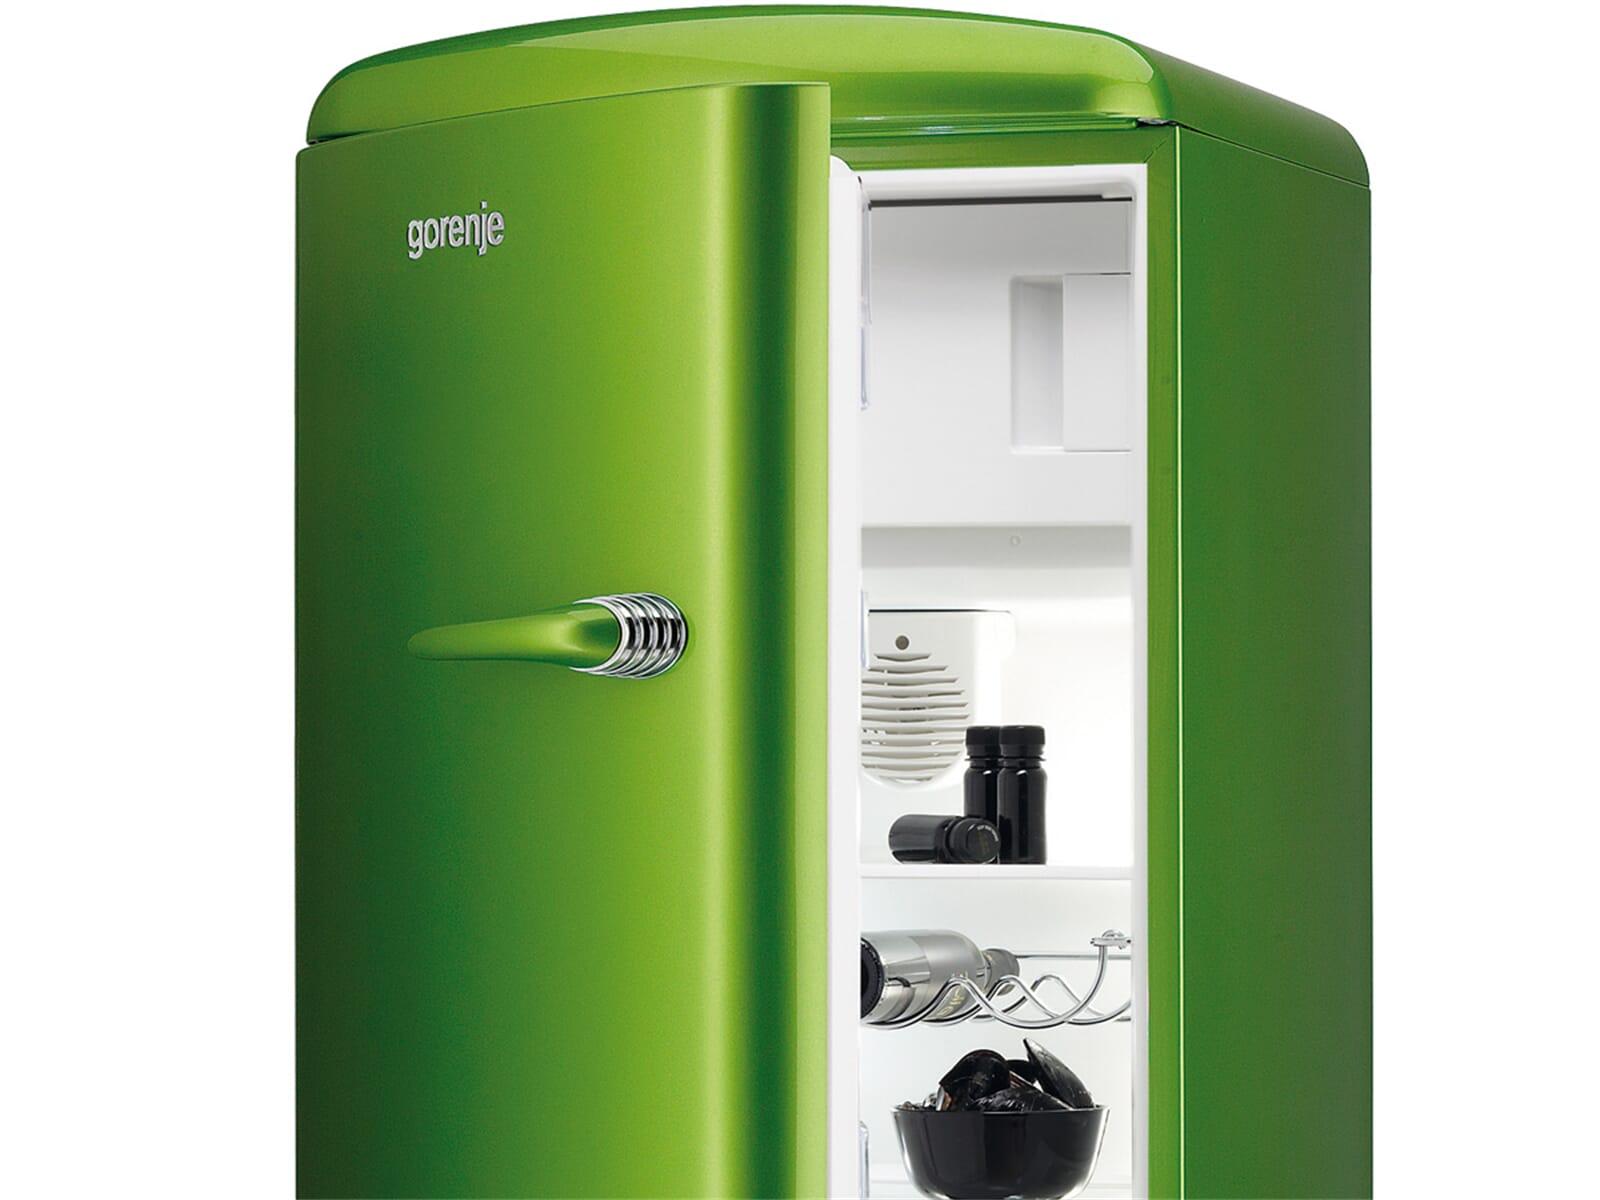 Retro Kühlschrank Pastellgrün : Bosch retro kühlschrank grün kühlschrank retro günstig ᐅ retro